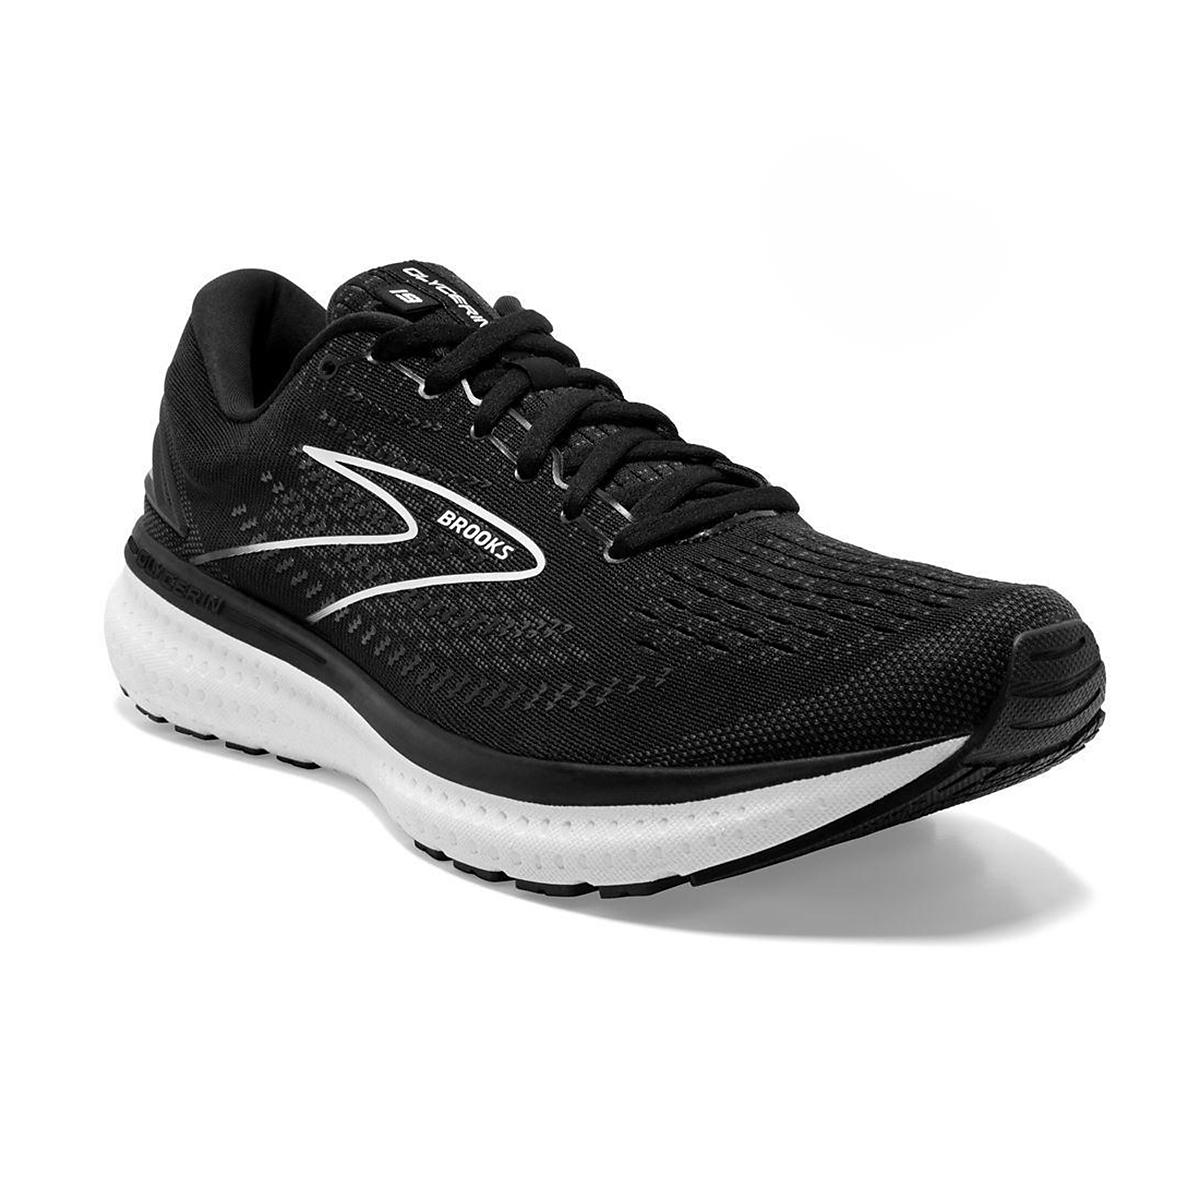 Women's Brooks Glycerin 19 Running Shoe - Color: Black/White - Size: 5 - Width: Regular, Black/White, large, image 3